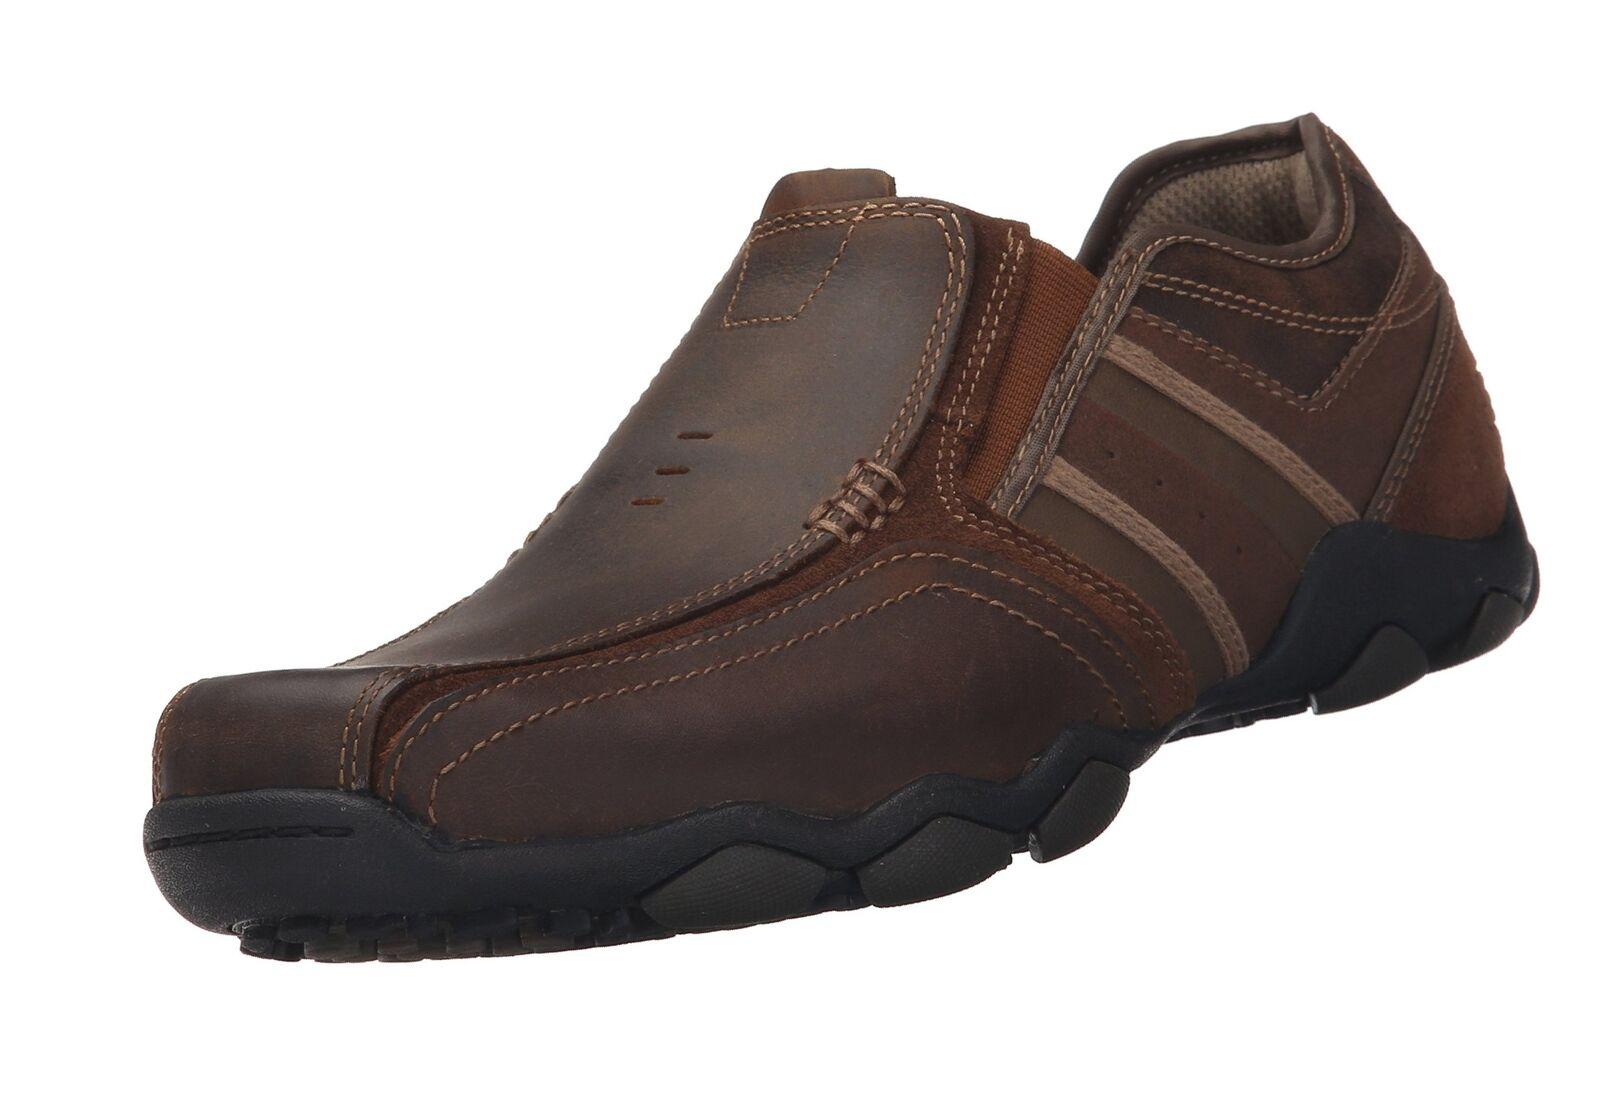 Skechers Men's Diameter-Zinroy Slip-On Loafer Dark Brown 11 D(M) US